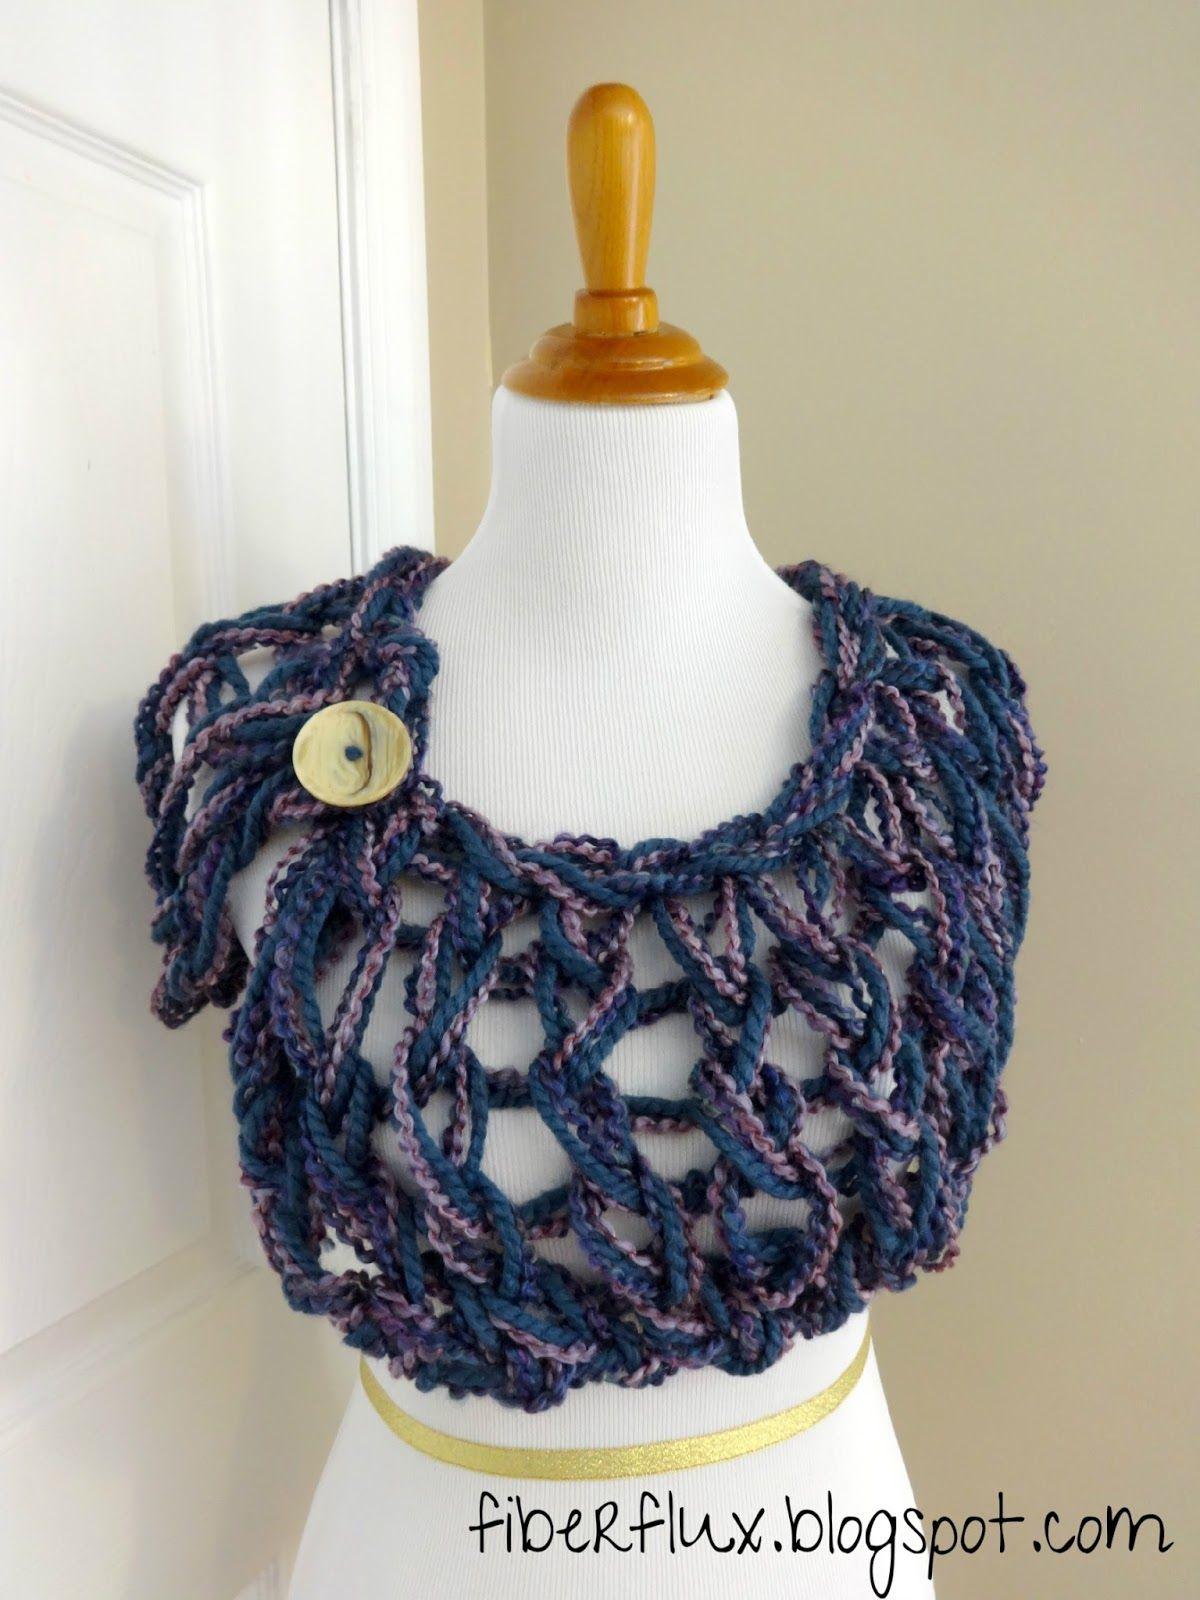 Fiber fluxventures in stitching free knitting patternm one night wrap free arm knitting pattern bankloansurffo Choice Image